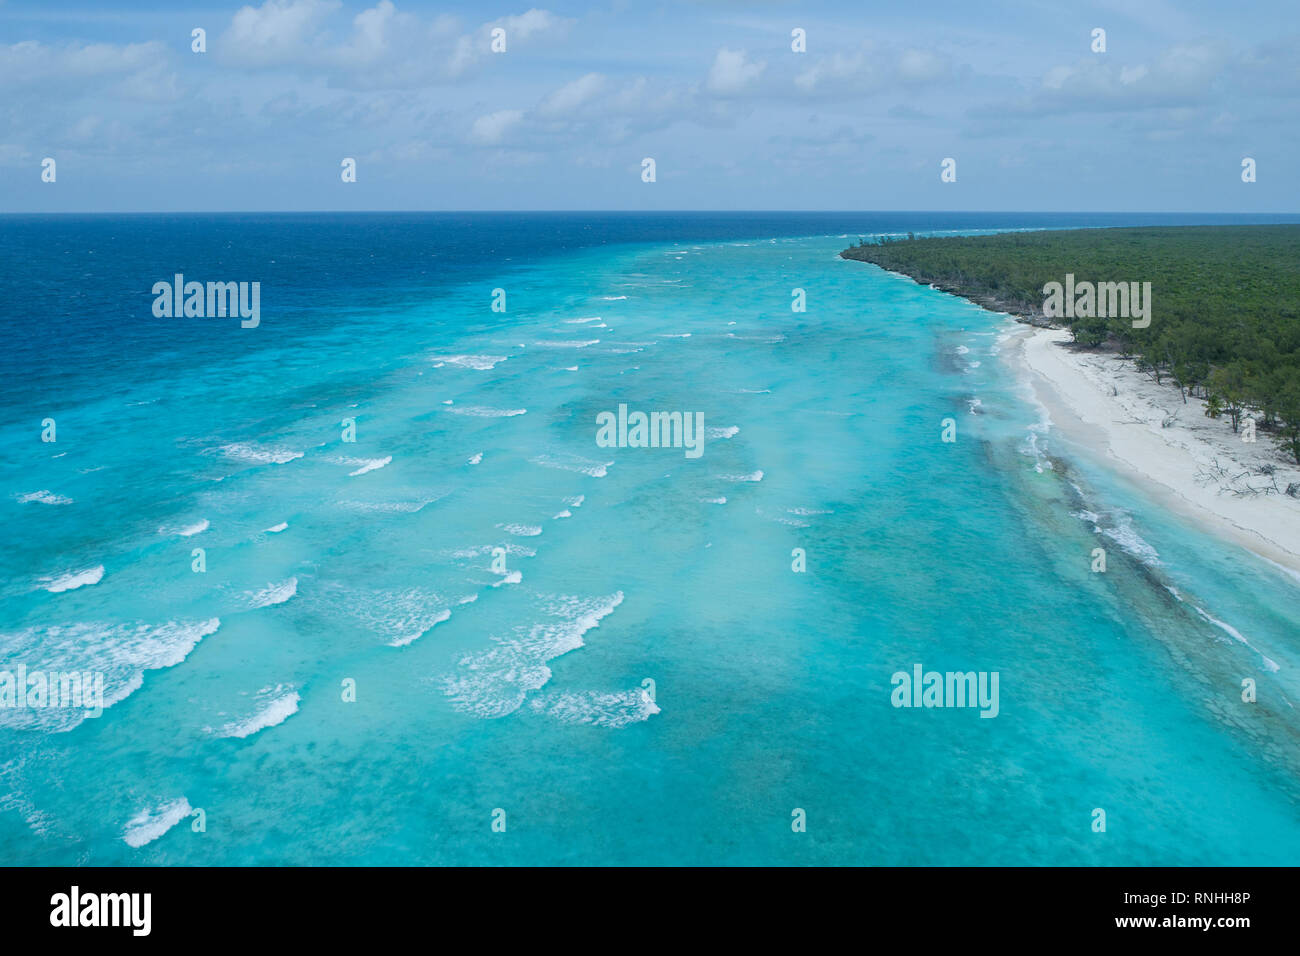 Aerial of Aldabra Atoll, Seychelles - Stock Image